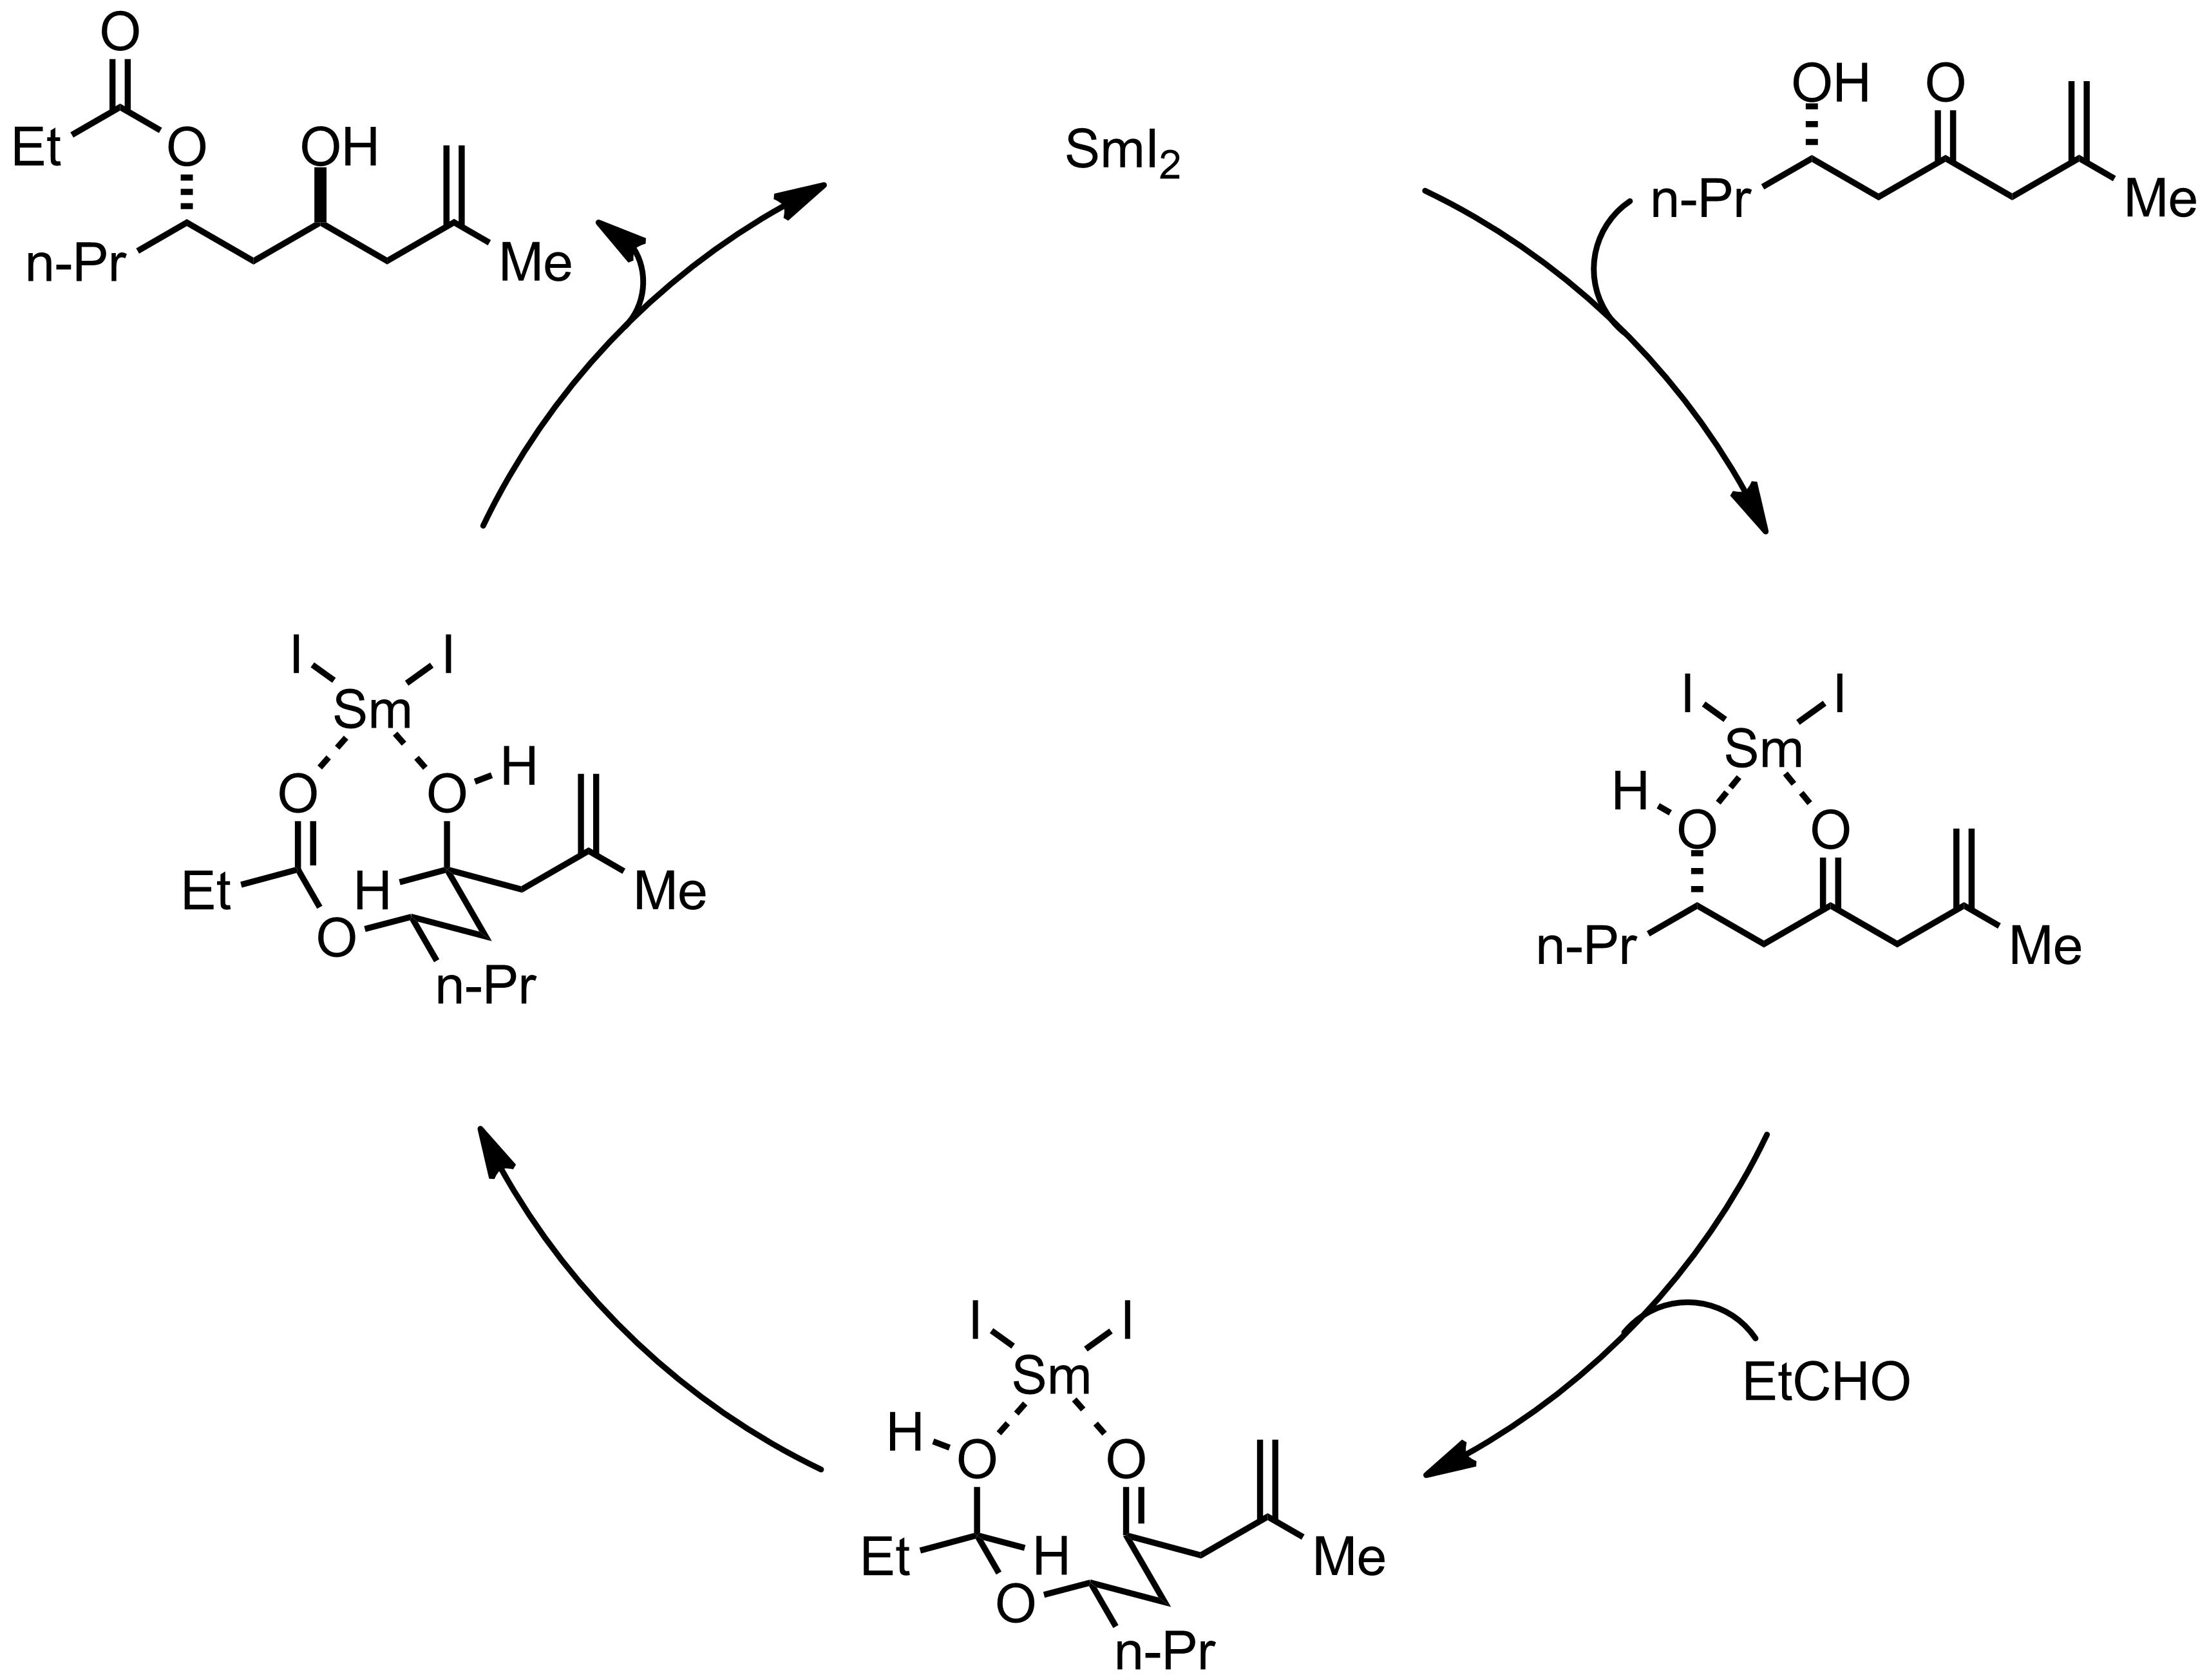 Mechanism of the Evans-Tishchenko Reaction